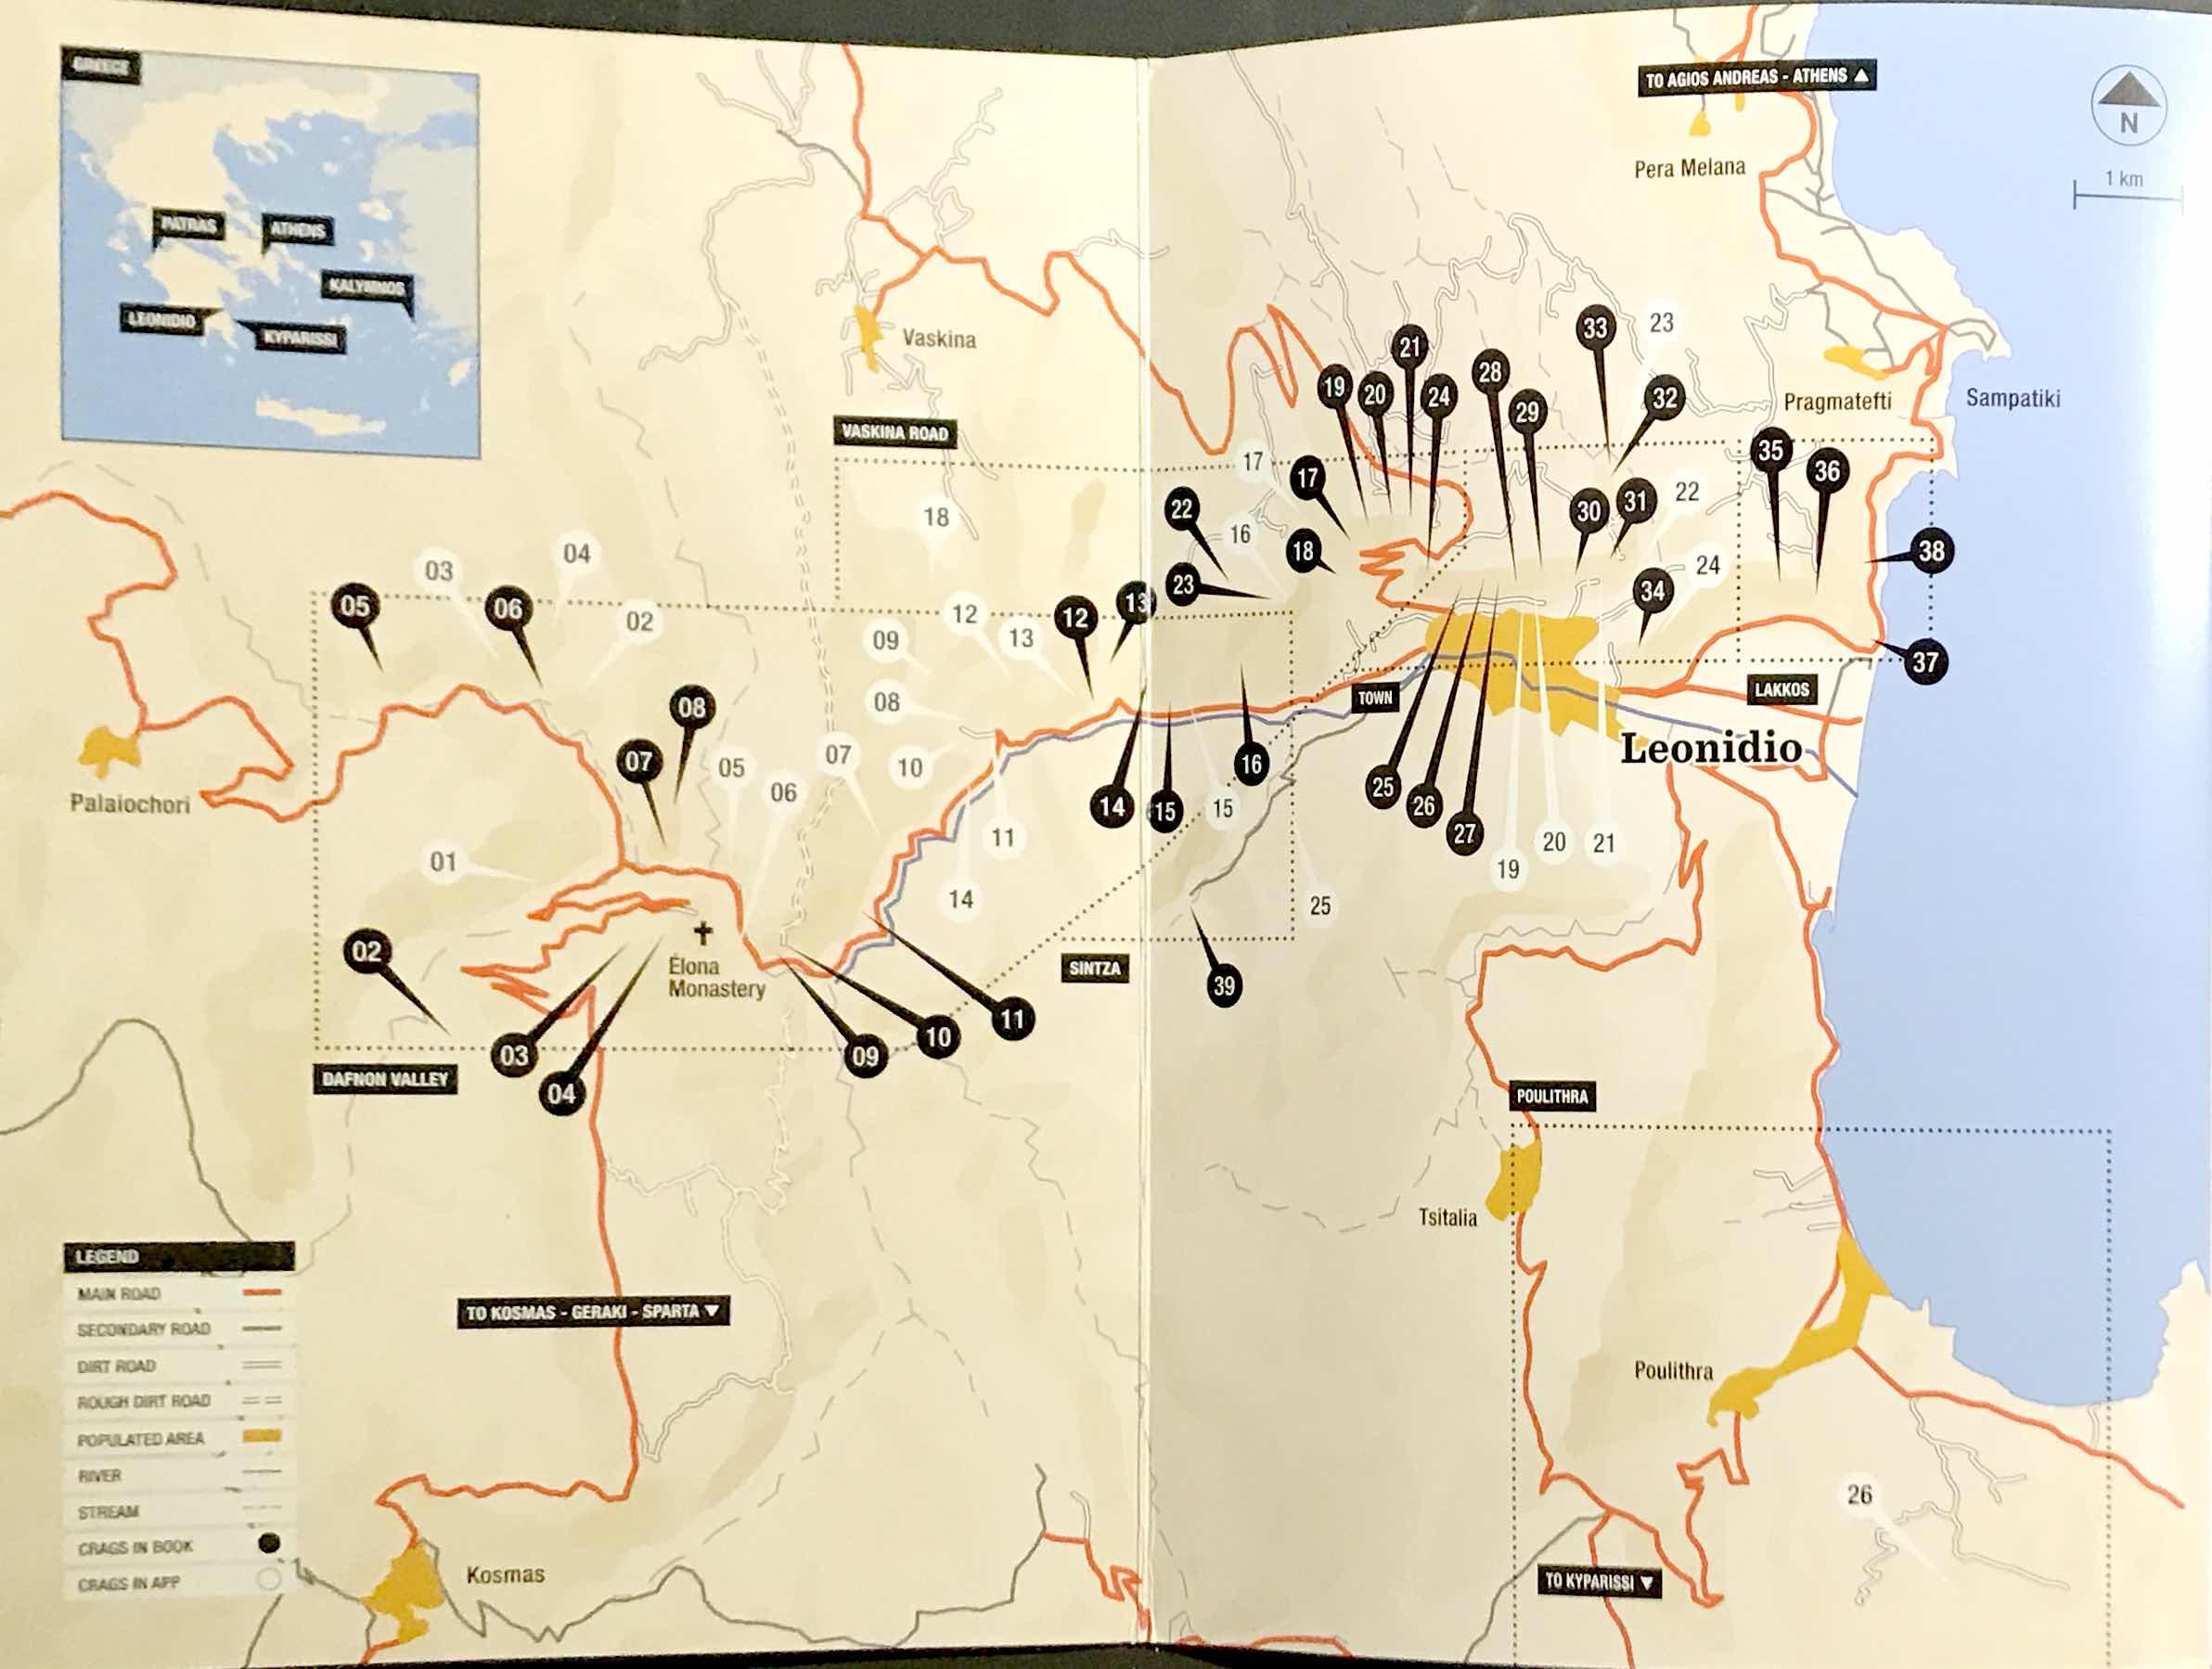 Leonidio @ Kyparissi - mapa